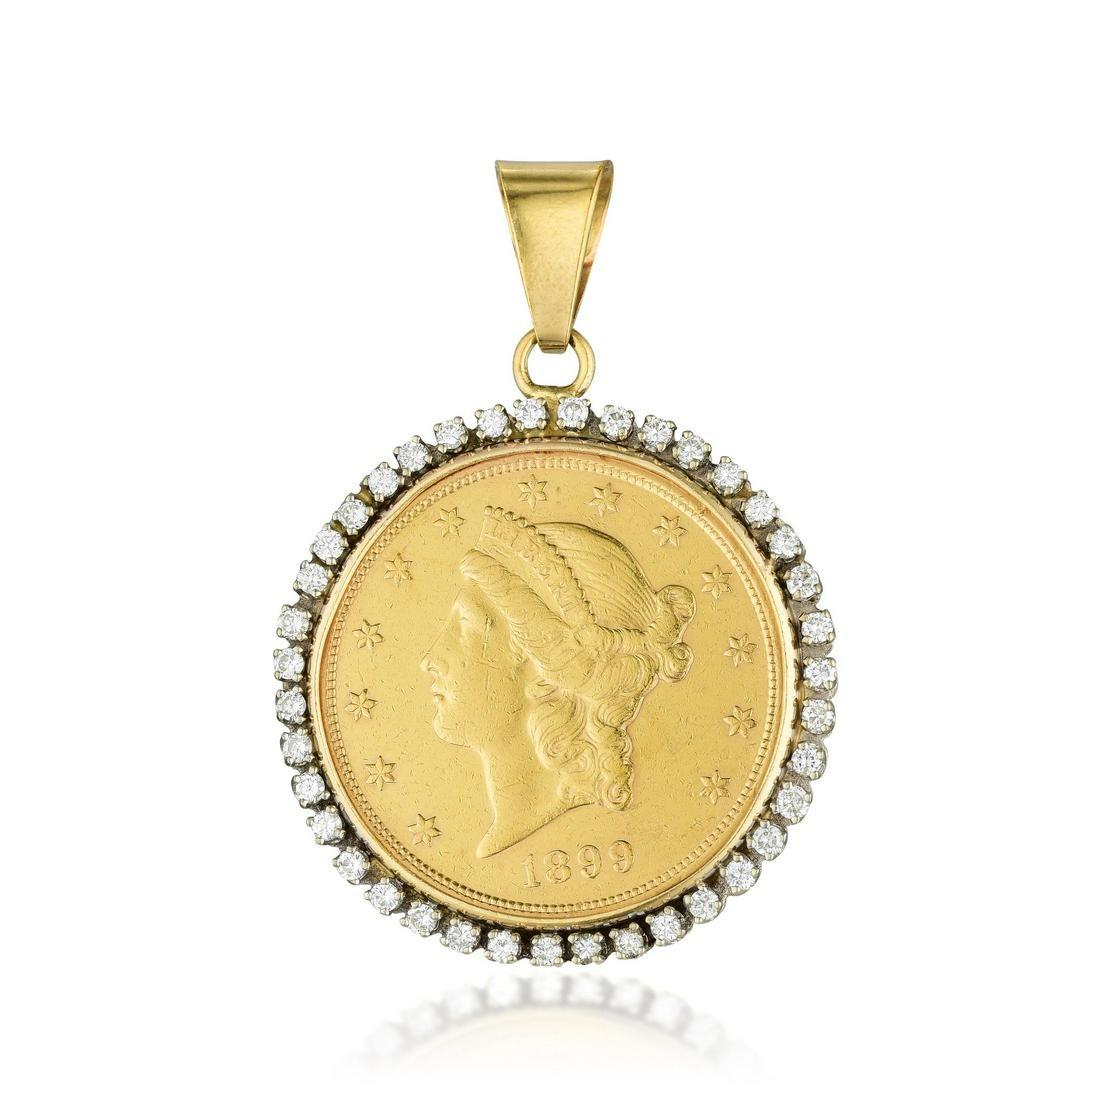 A Lady Liberty Twenty Dollar Gold Coin Diamond Pendant